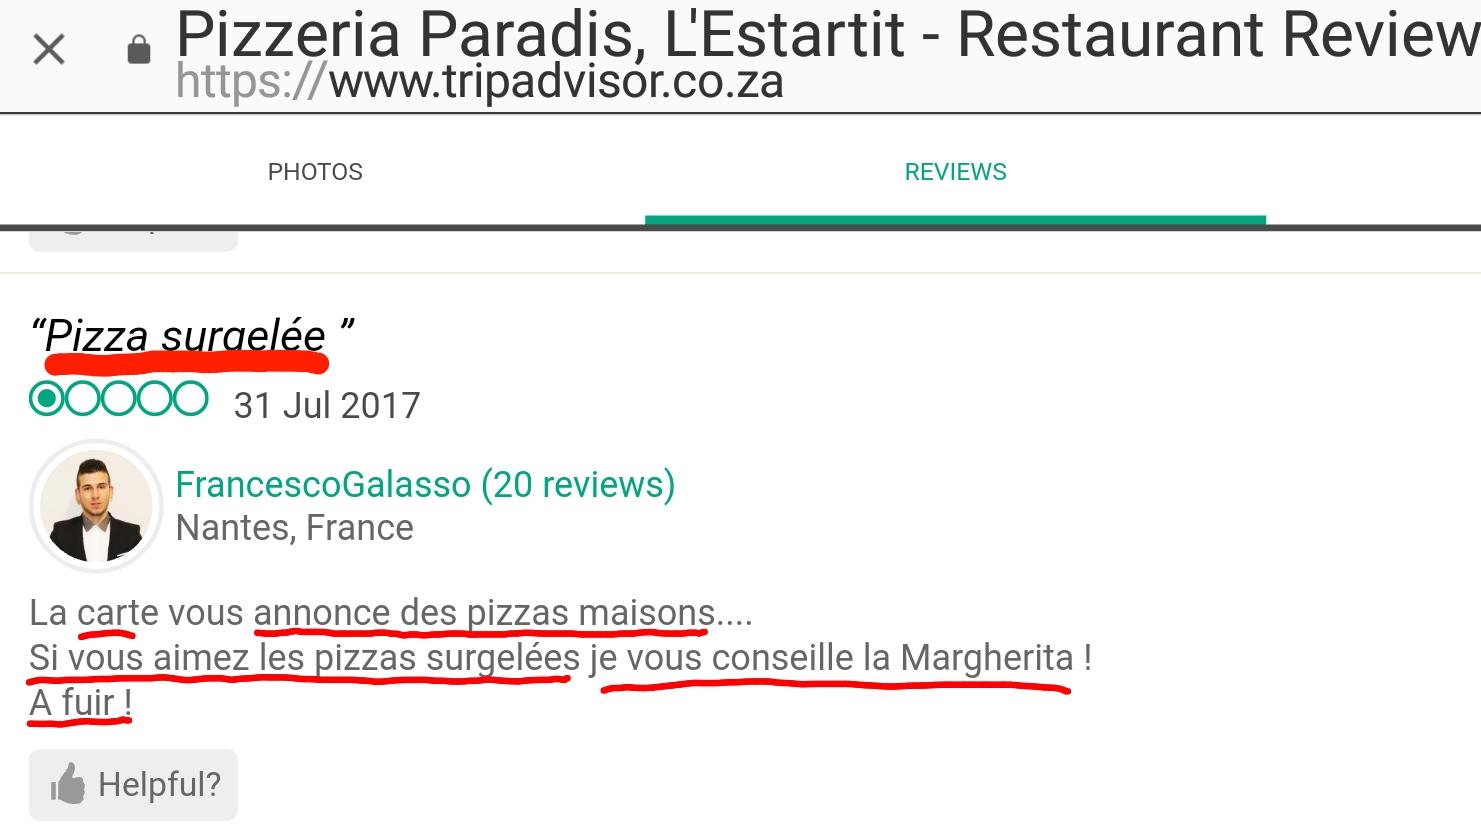 Pizzes surgeles paradis estartit restaurant